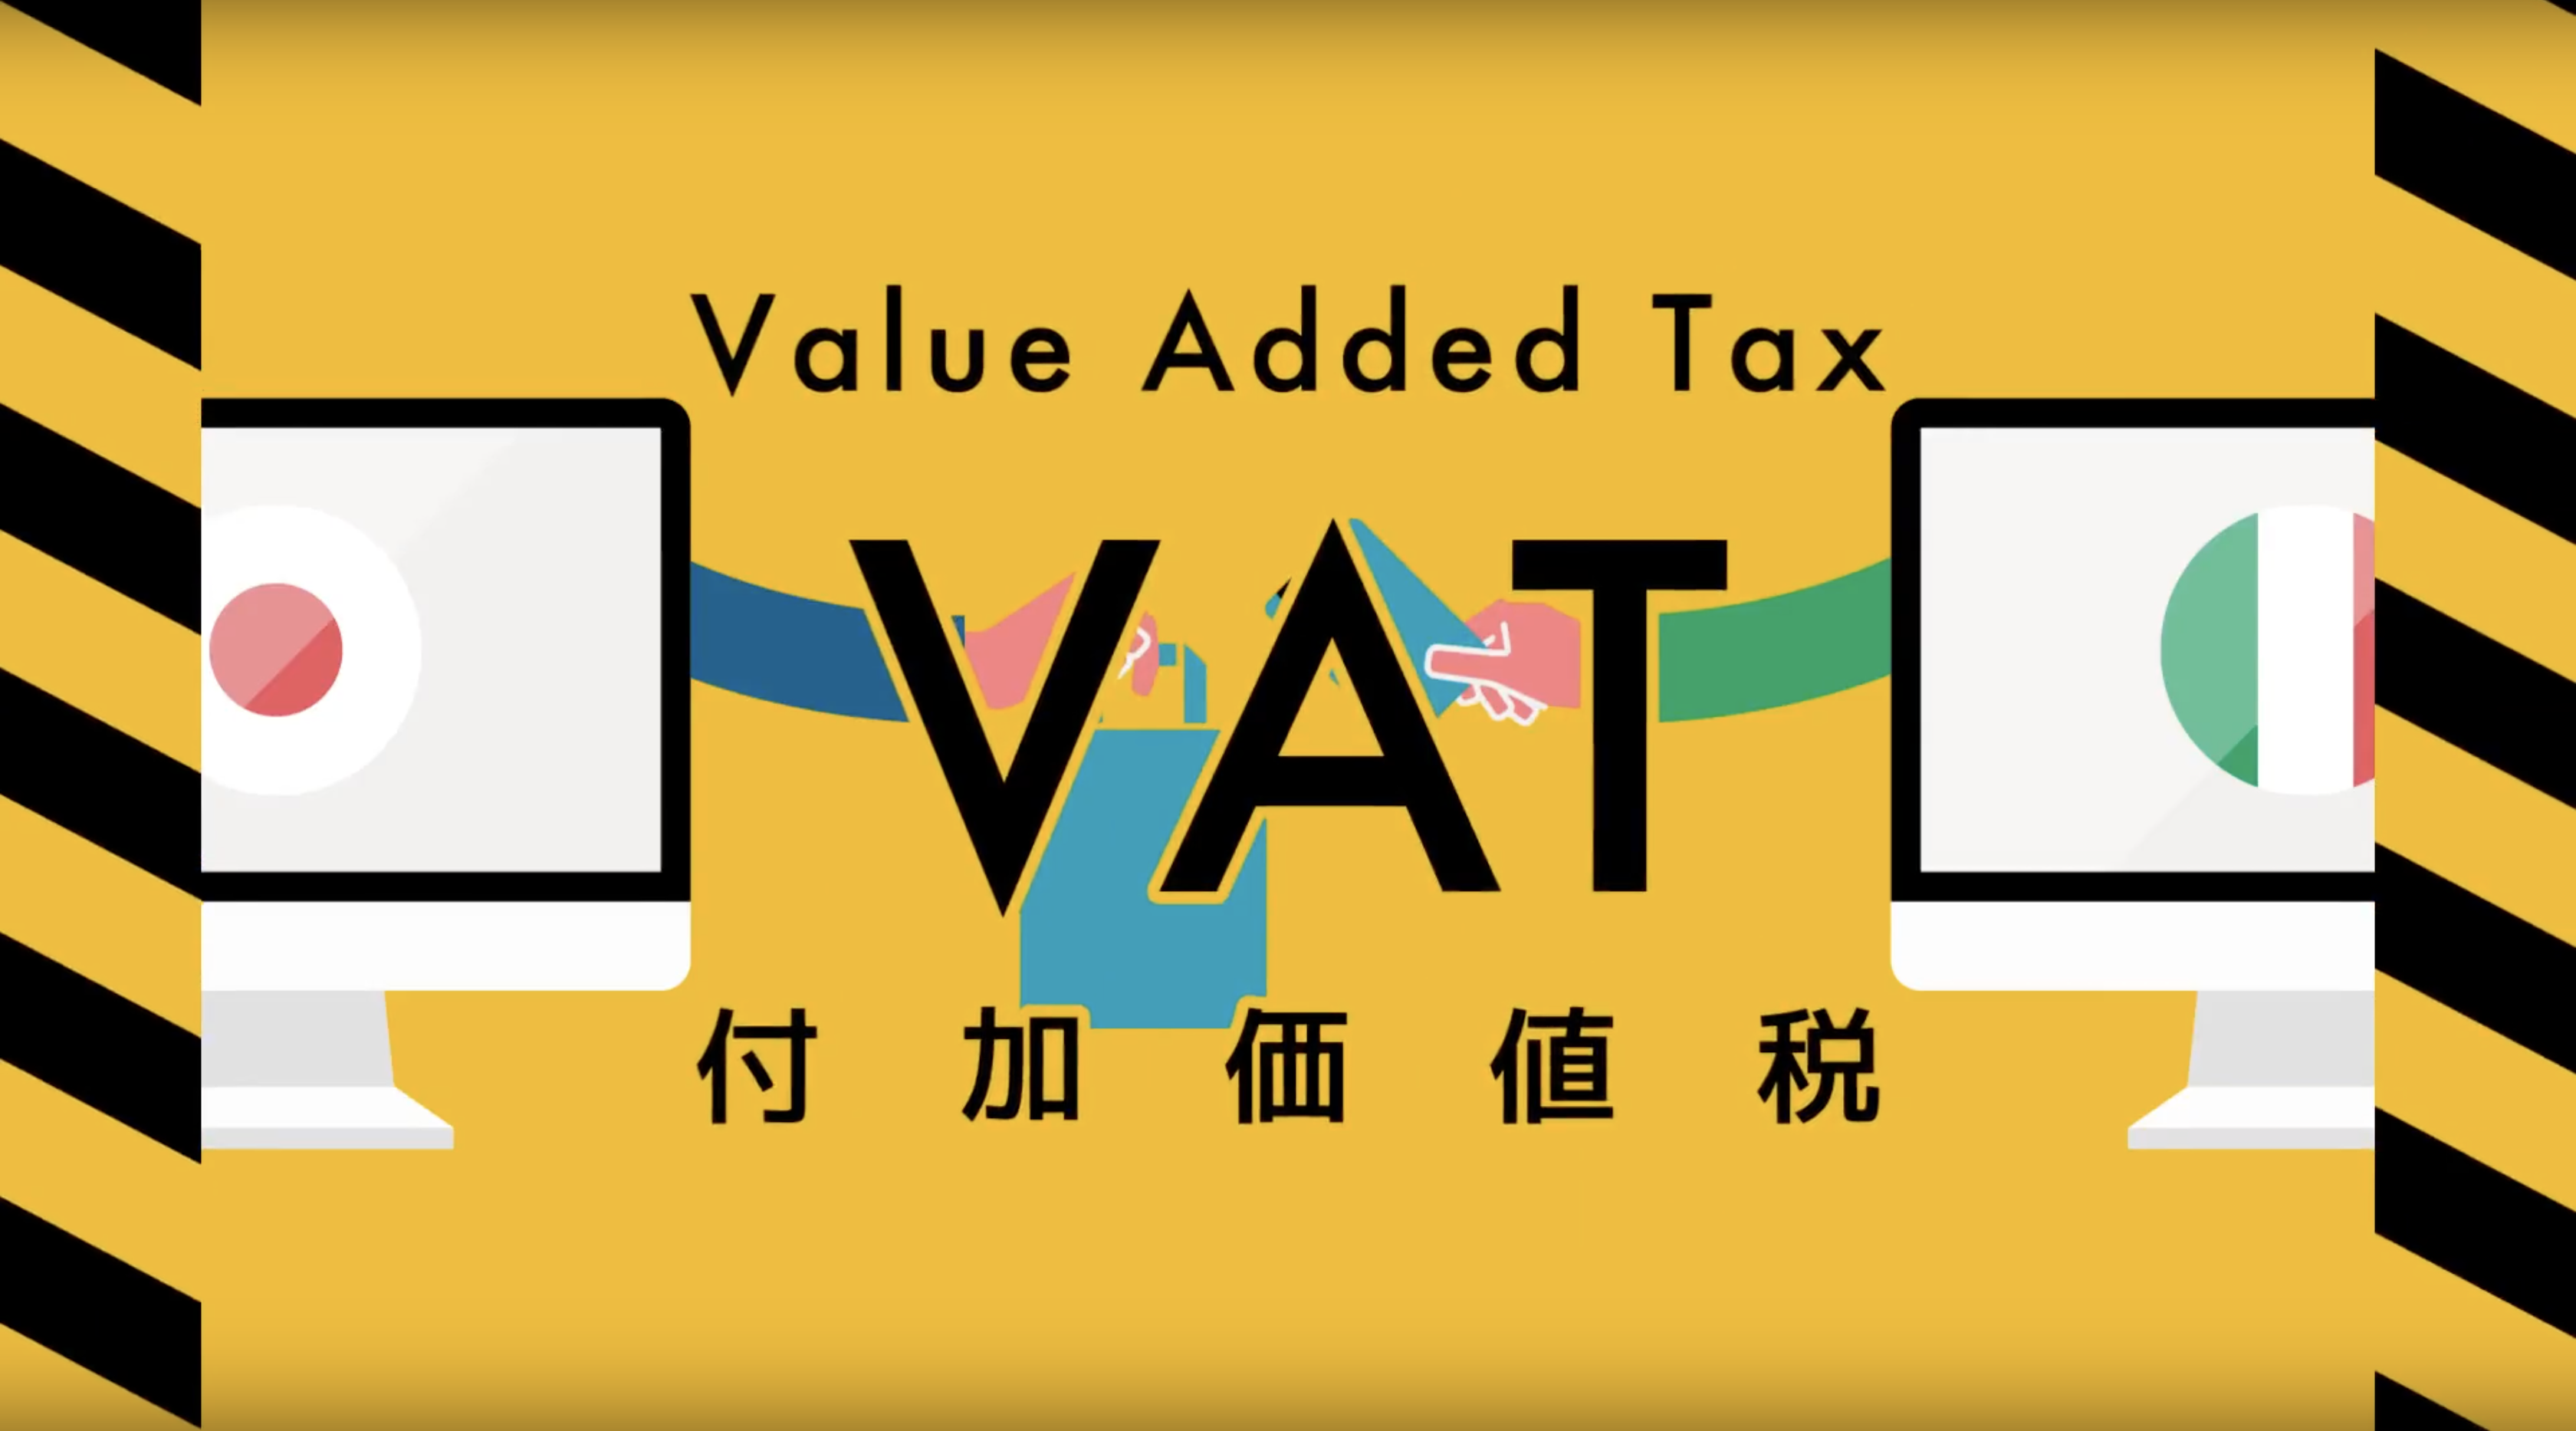 VAT_image.png